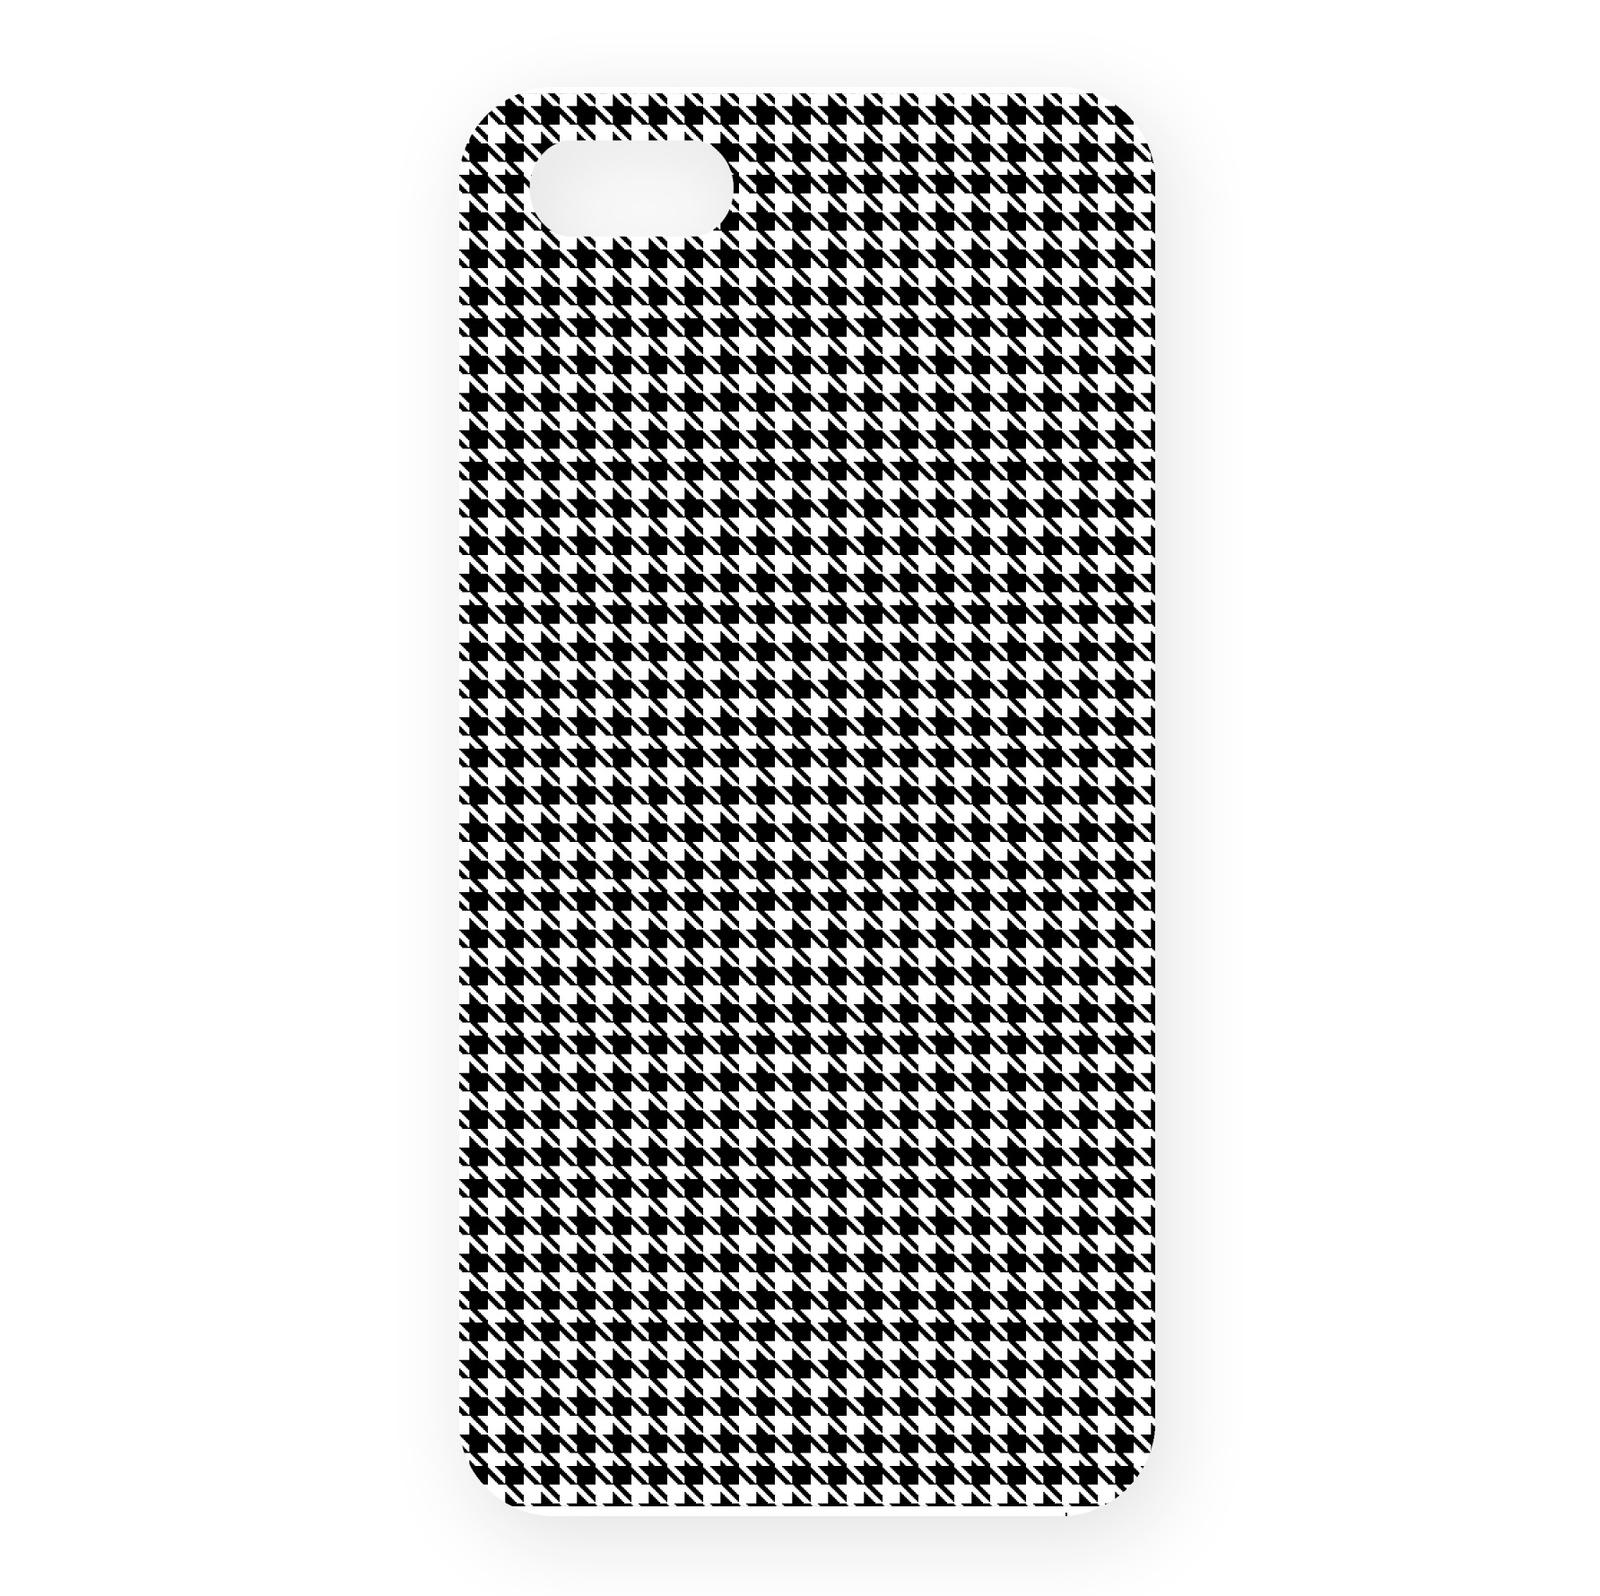 цена Чехол для сотового телефона Mitya Veselkov IP5.MITYA, IP5.MITYA-256 онлайн в 2017 году